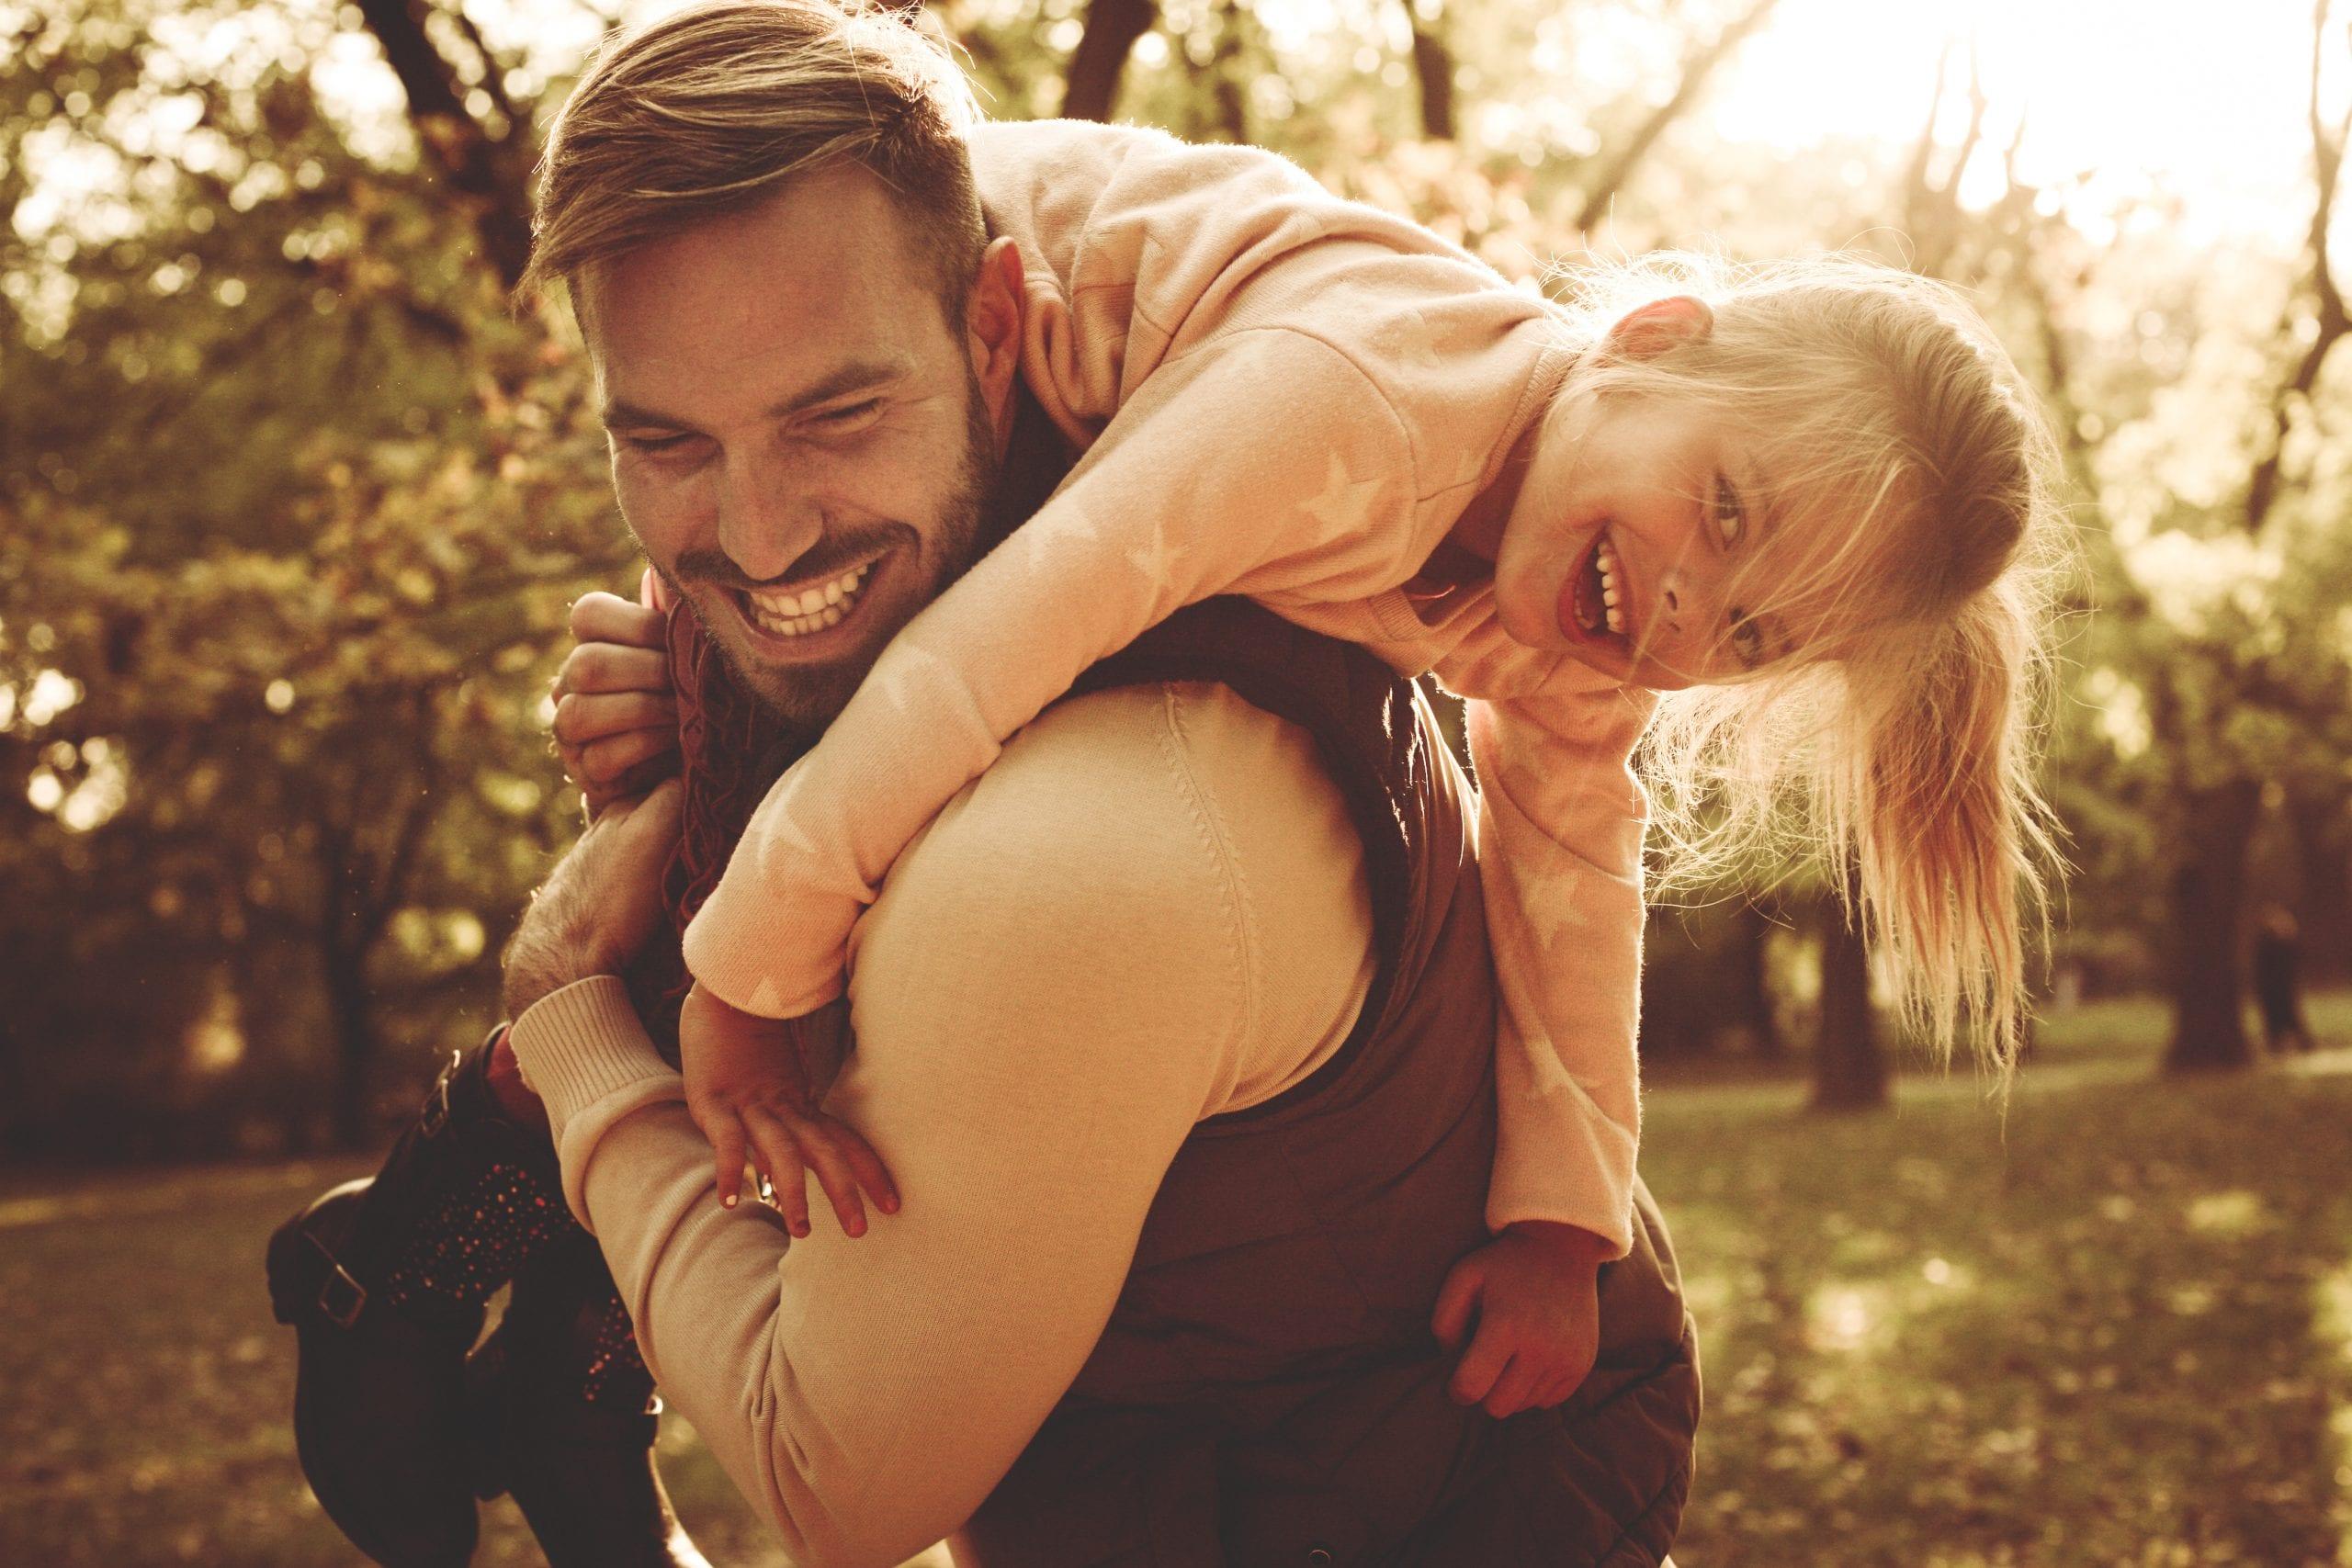 Parenting Arrangement, Custody, Guardianship, reduce support, parental alienation